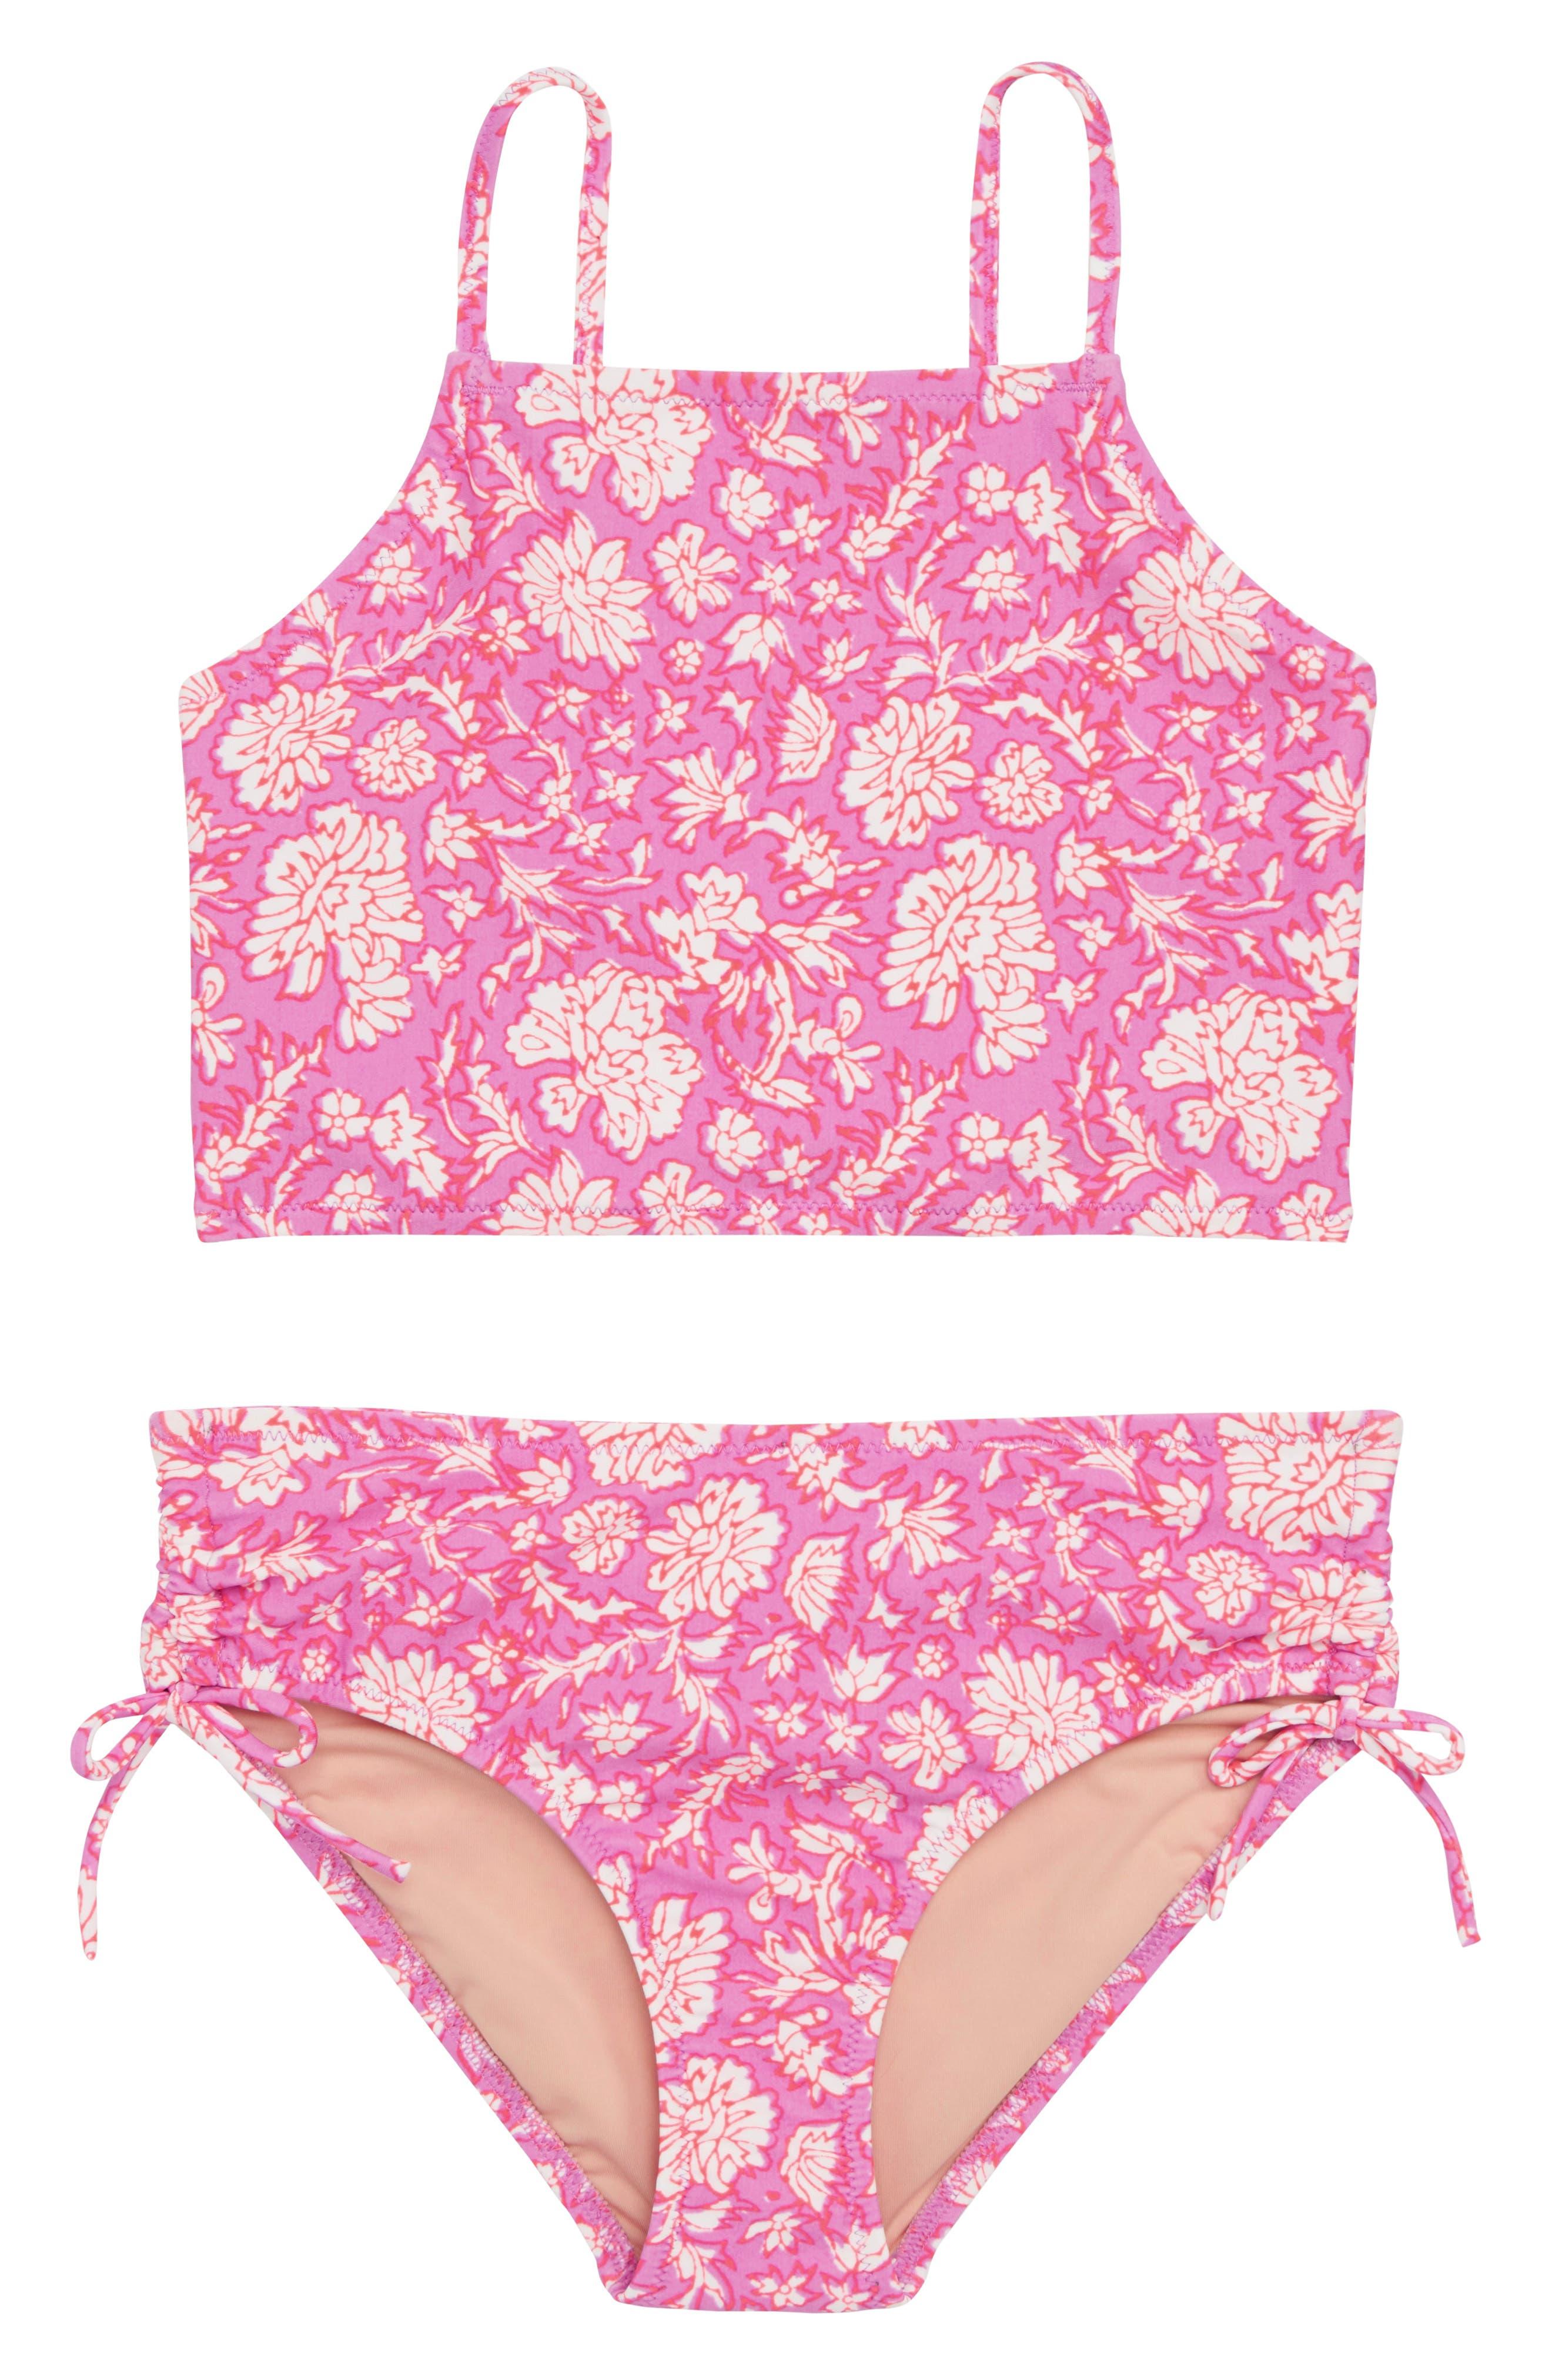 SZ Blockprints<sup>™</sup> Two-Piece Tankini Swimsuit,                             Main thumbnail 1, color,                             Ivory Lavender Multi